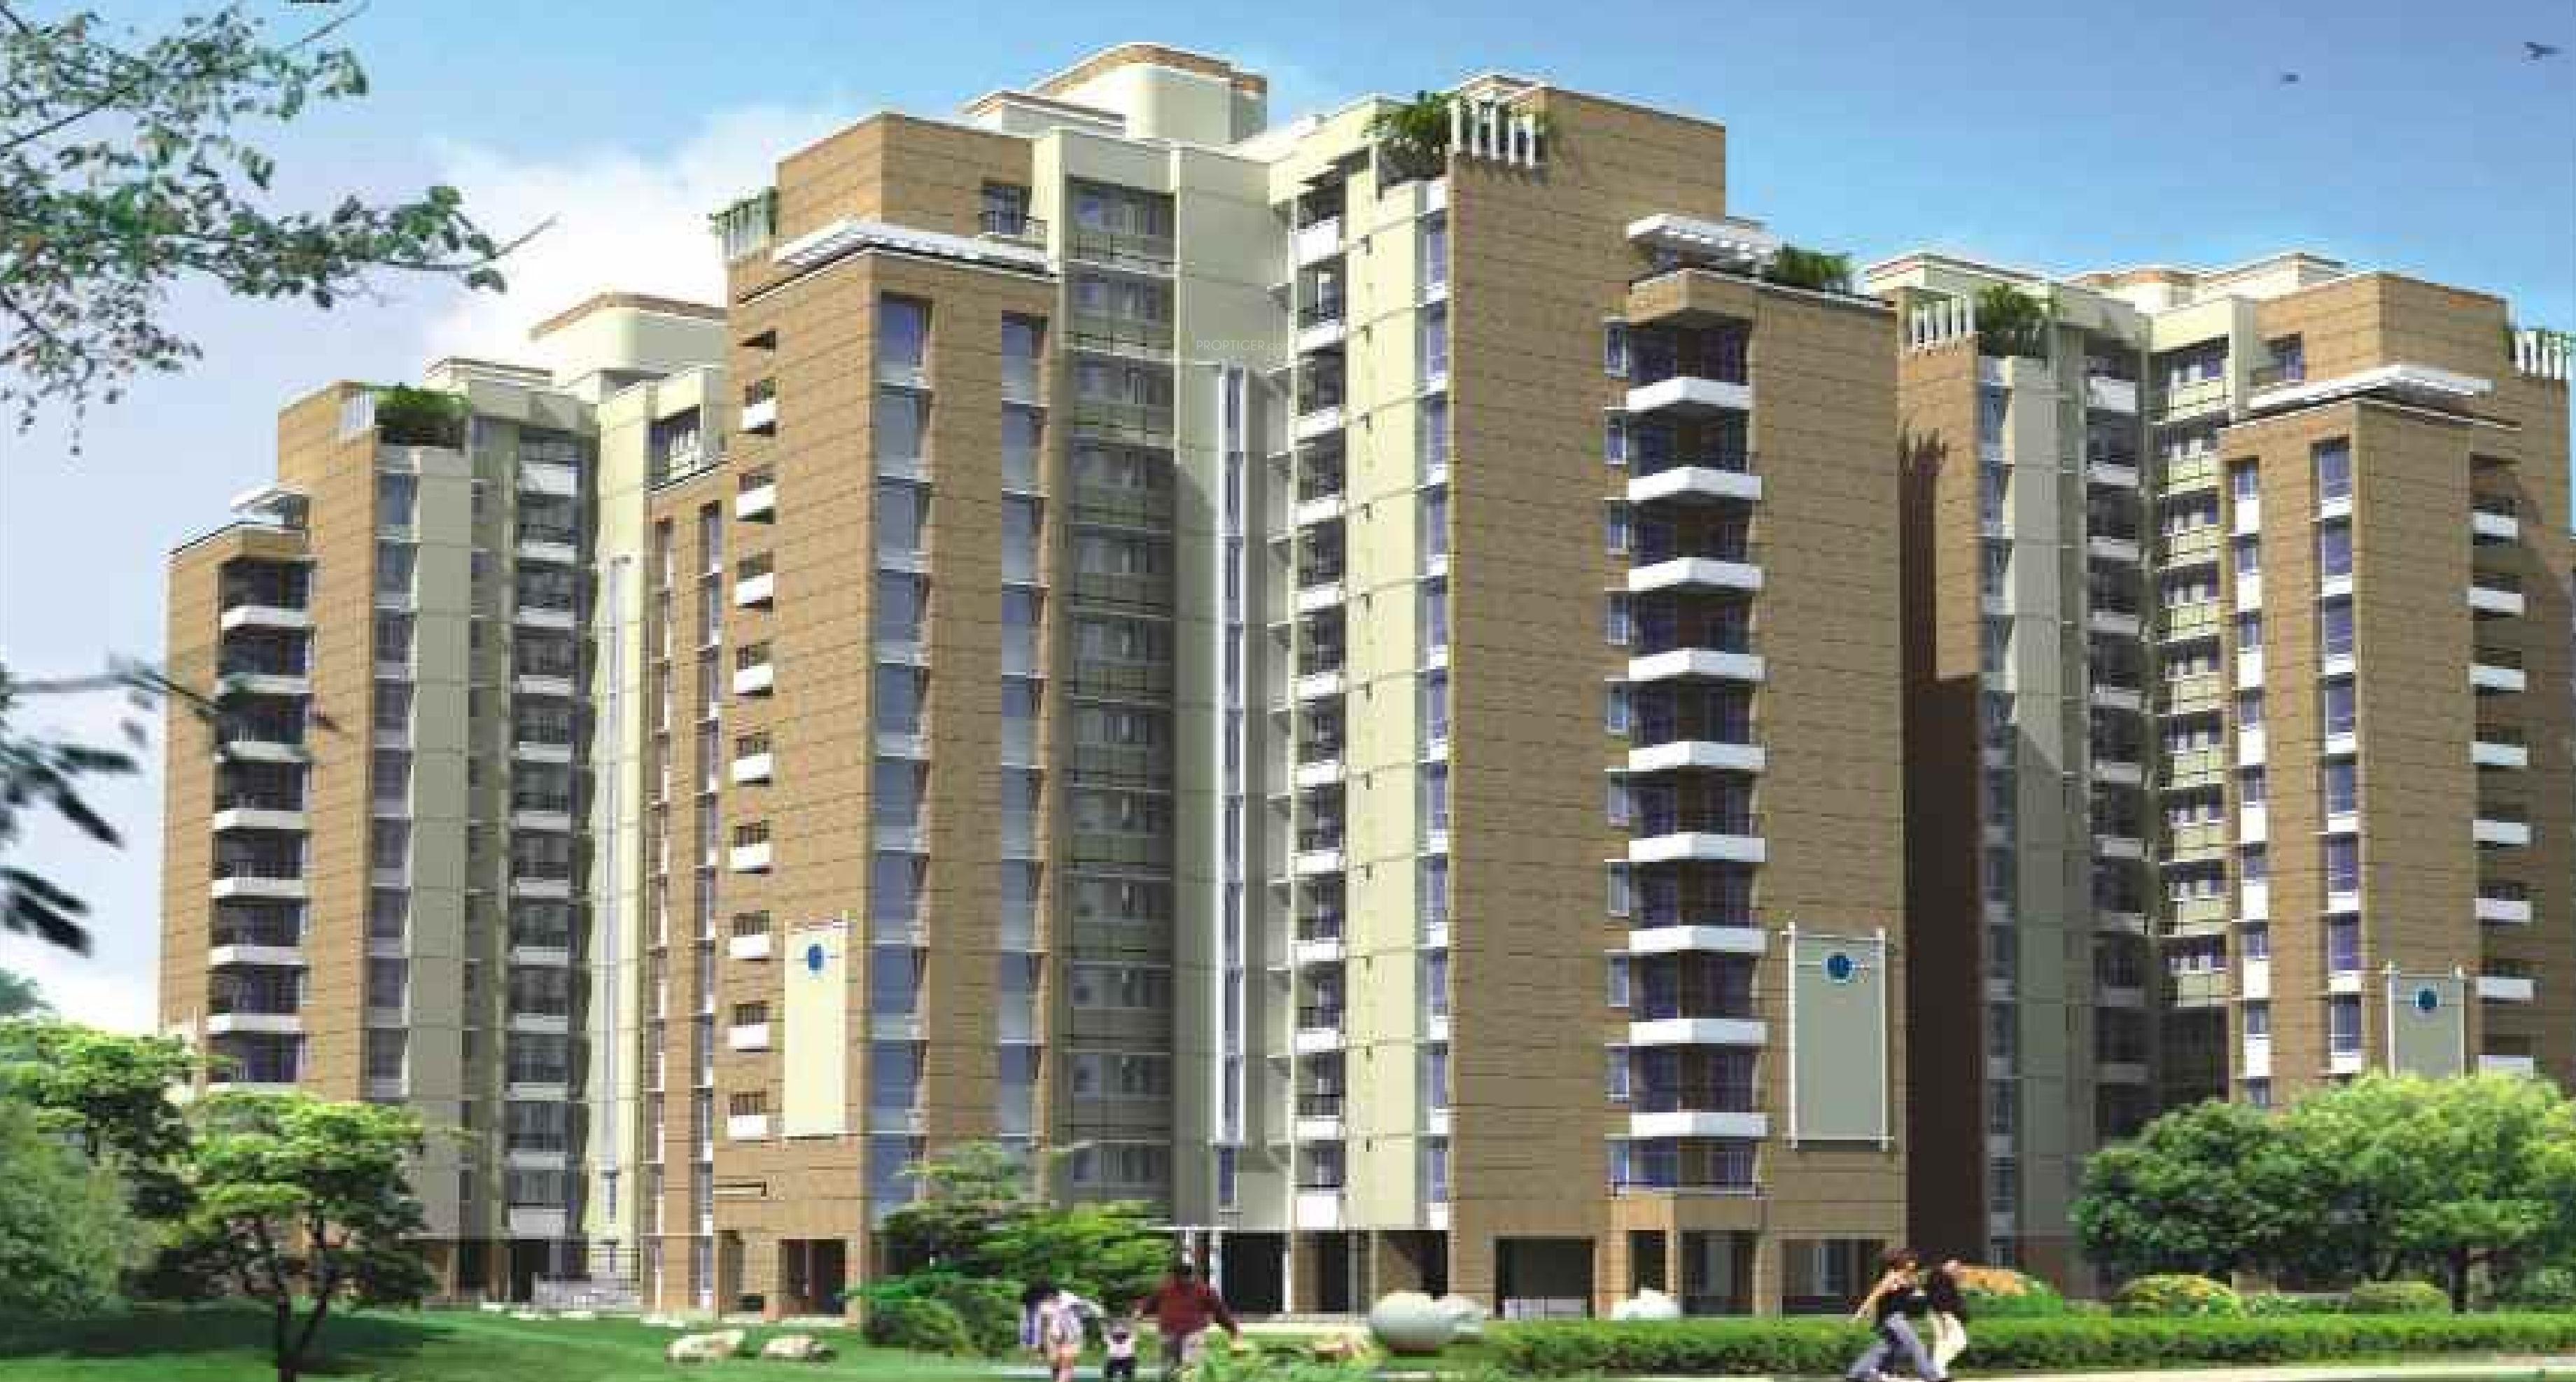 Plots in Goa – Buy Residential Plots for Sale in Goa